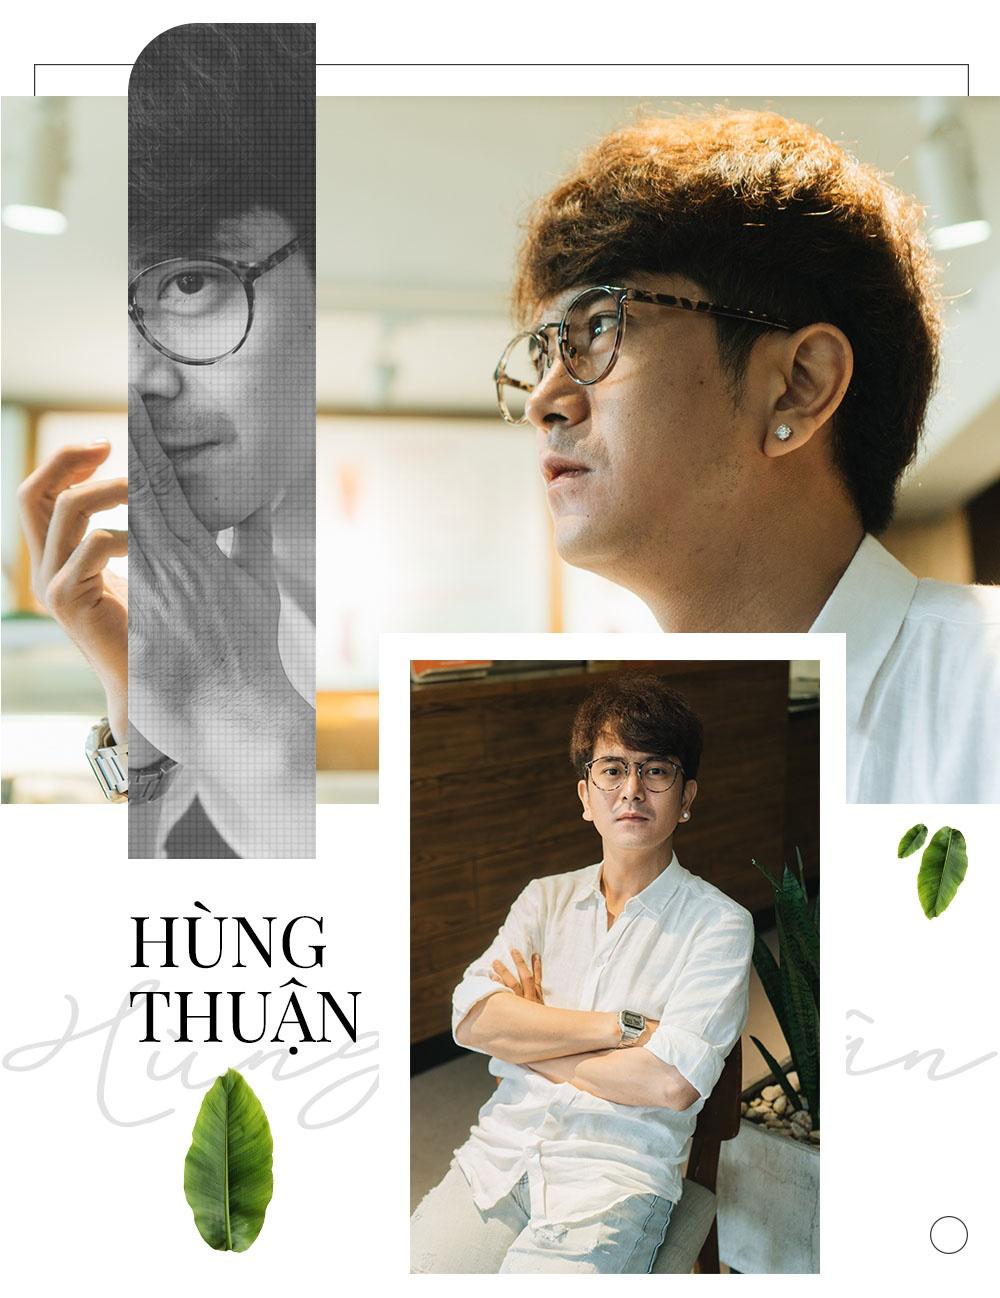 Hung Thuan anh 7